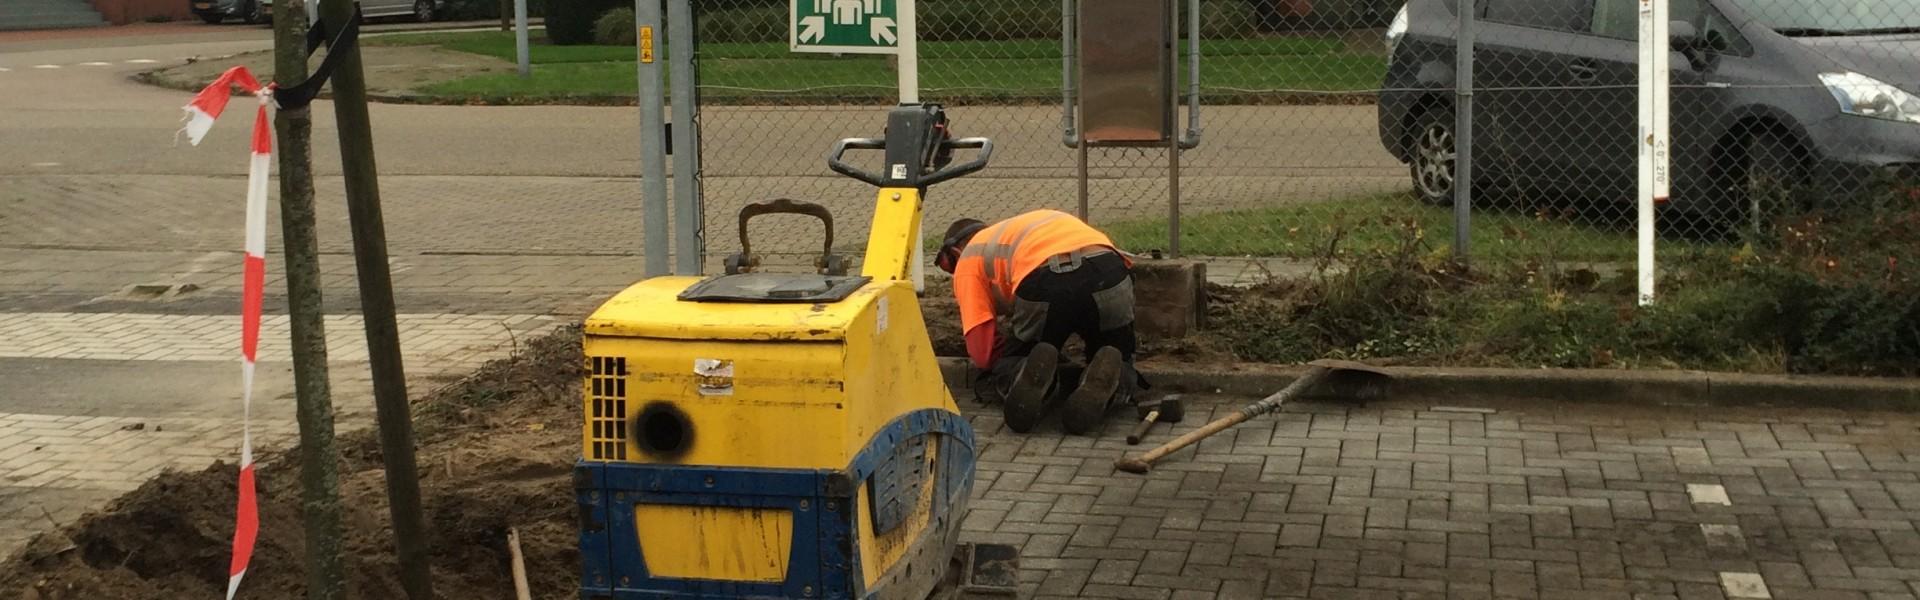 Herstraten parkeerterrein Ovenbouw Velsen